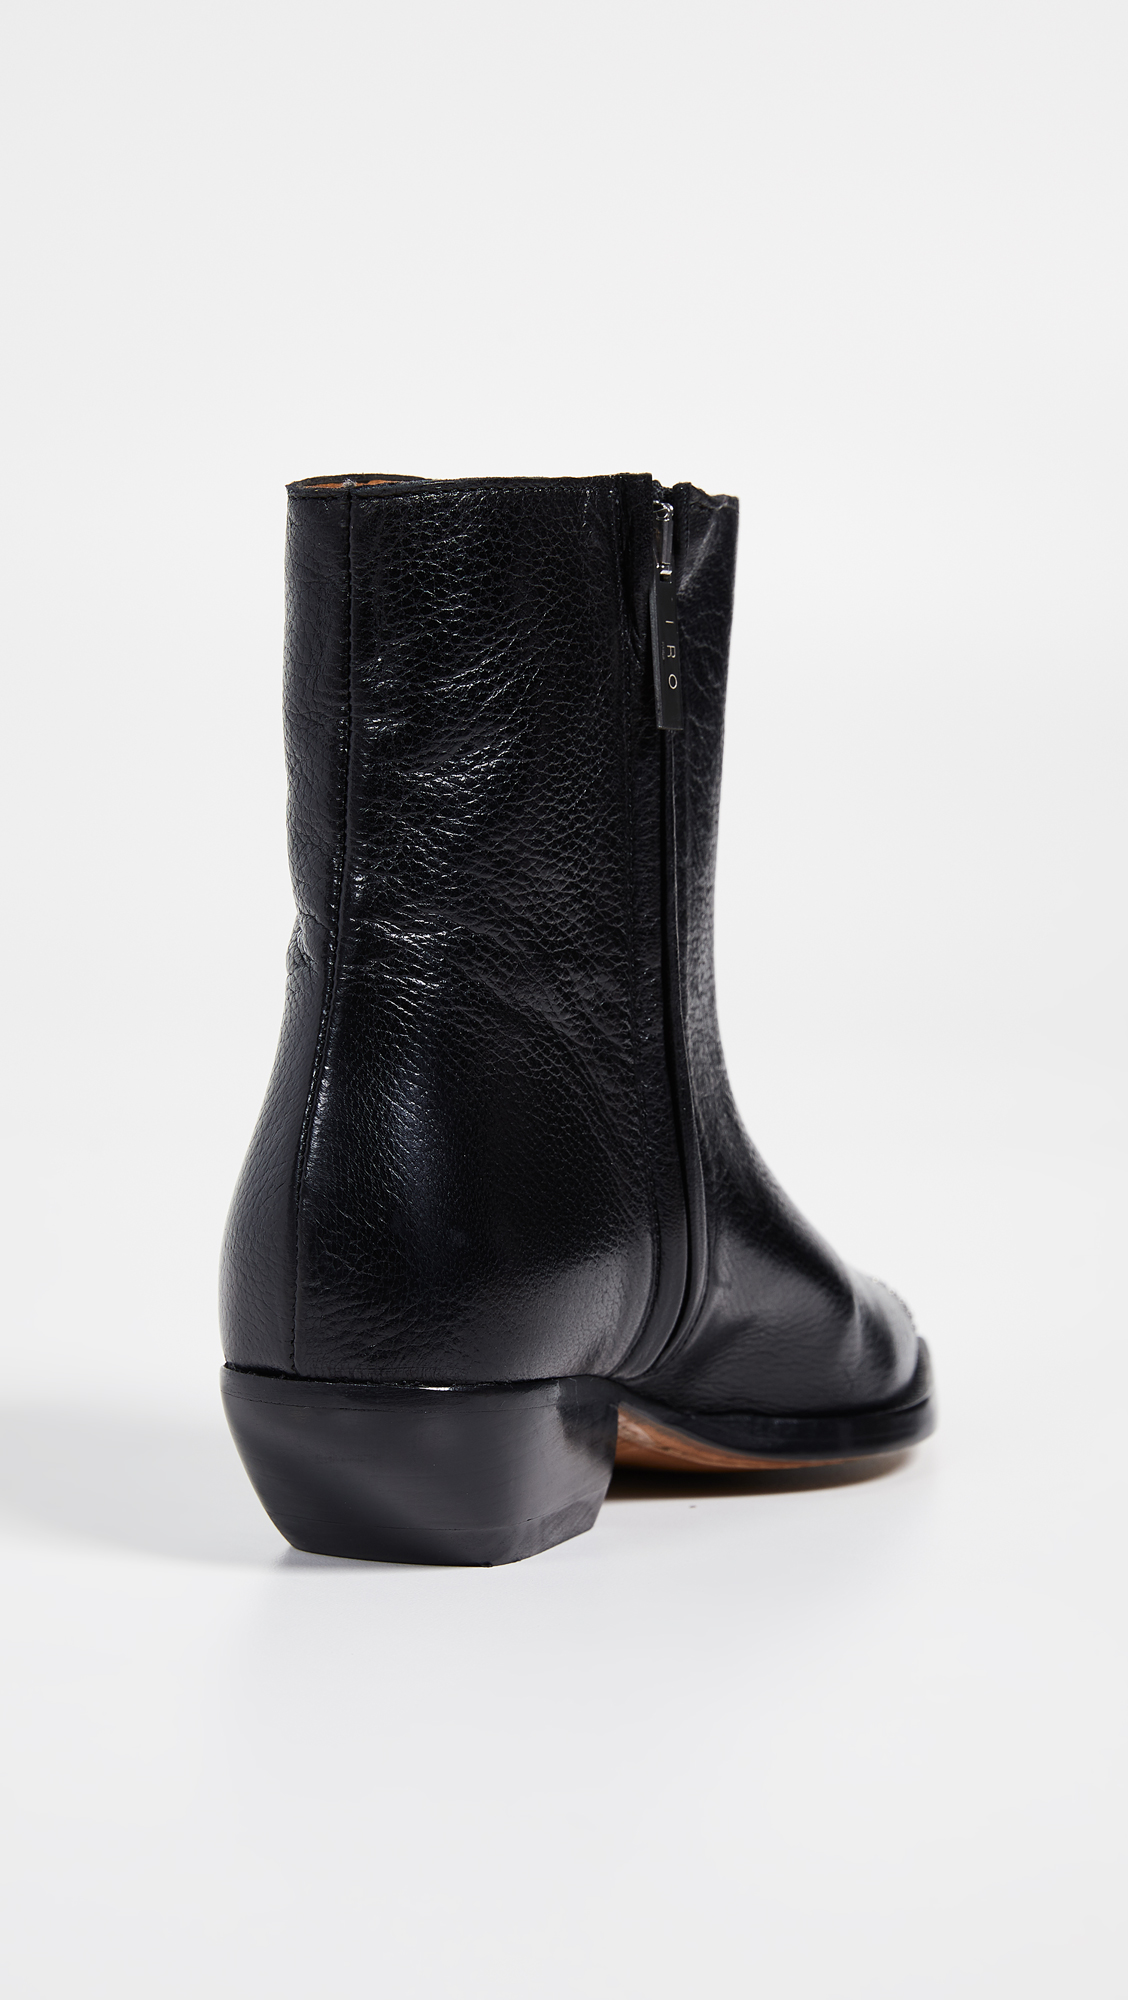 9222ea5422e8d IRO Santiago Boots